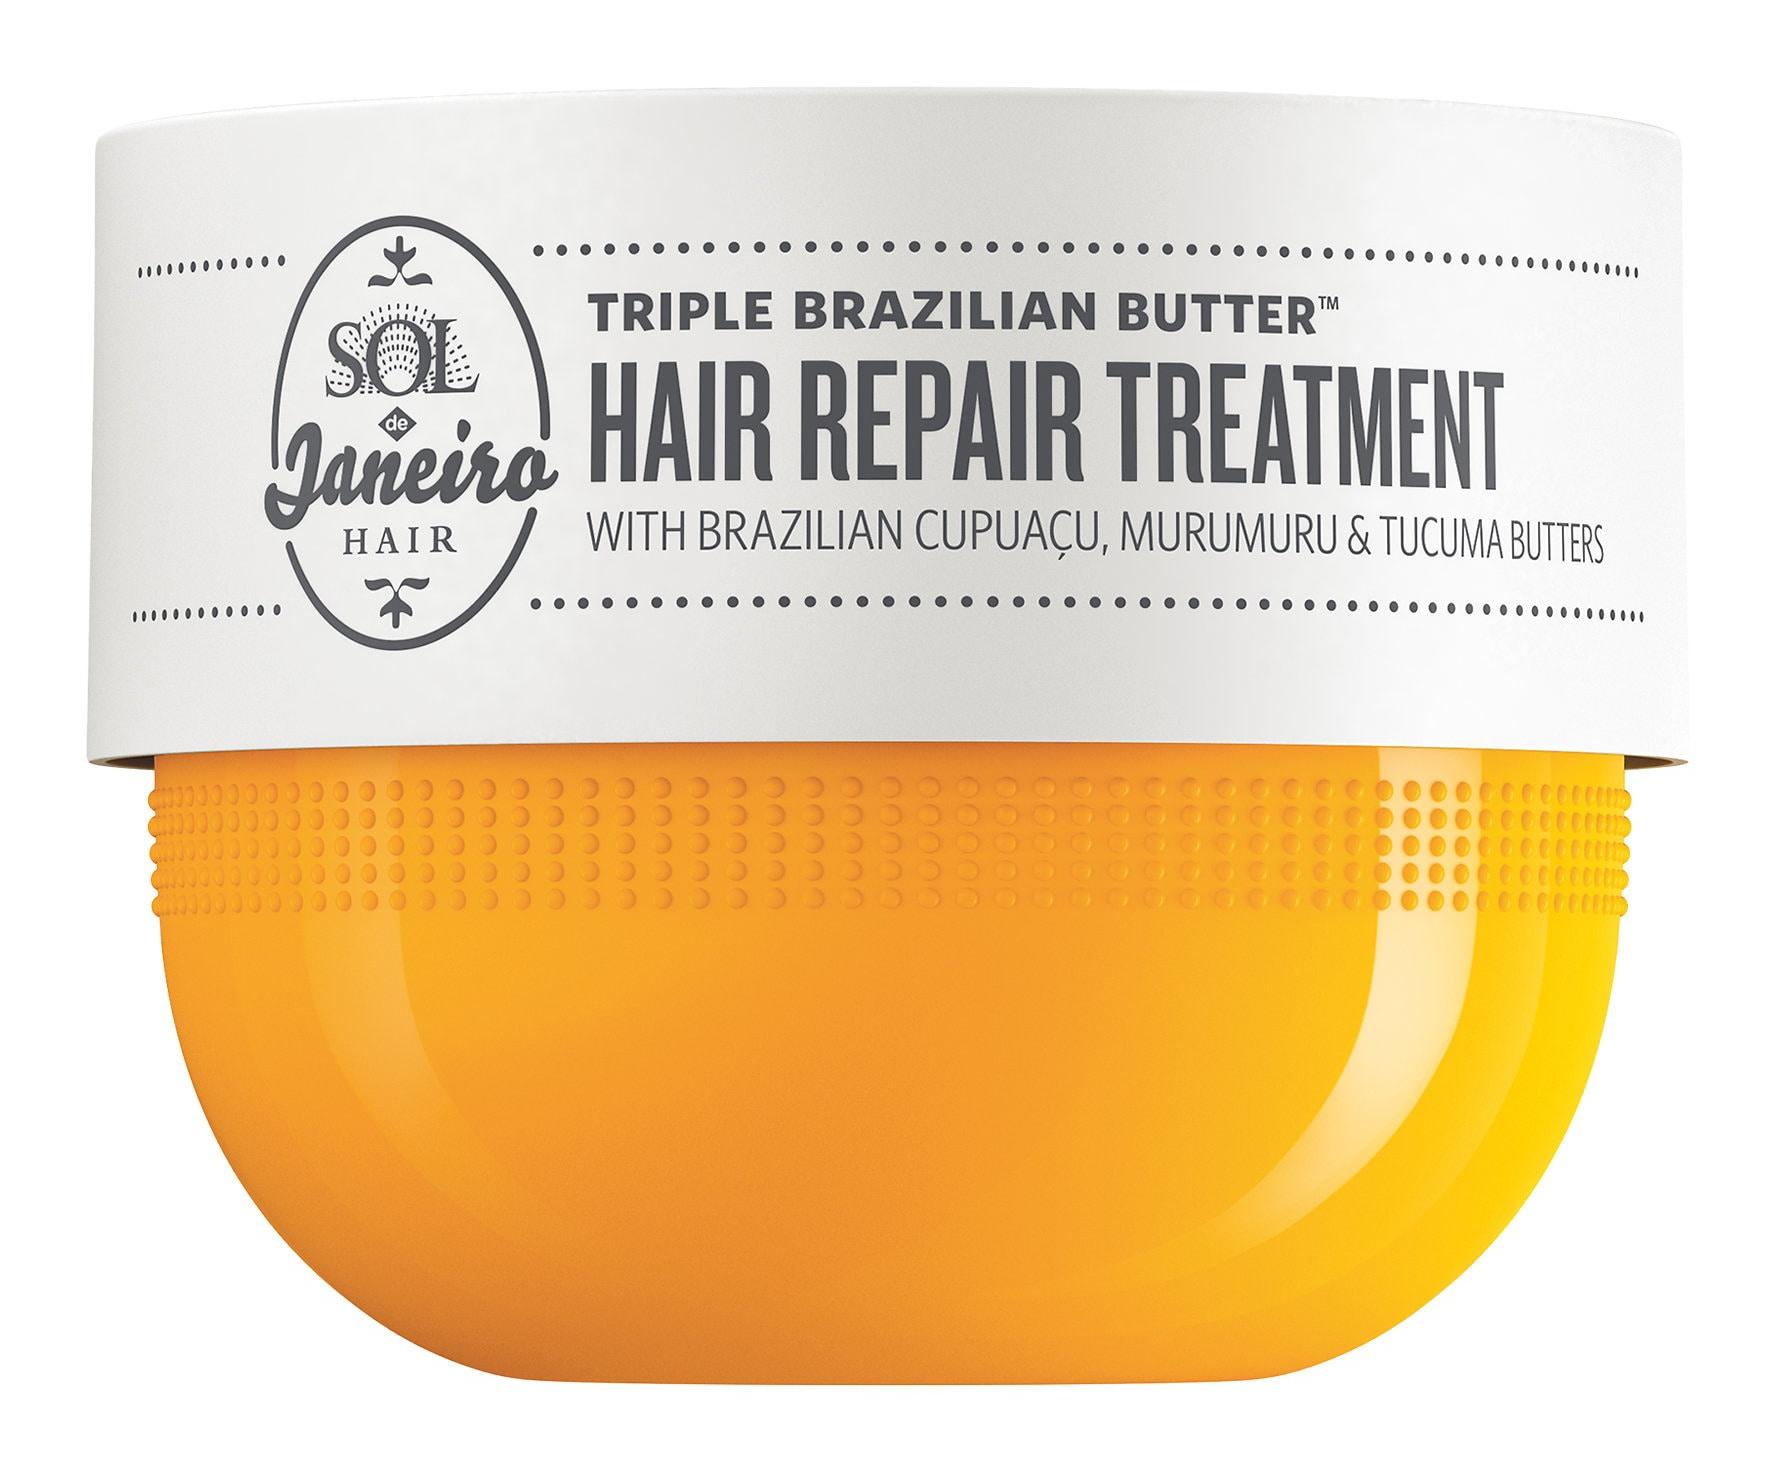 Sol de Janeiro Hair Repair Treatment Mask